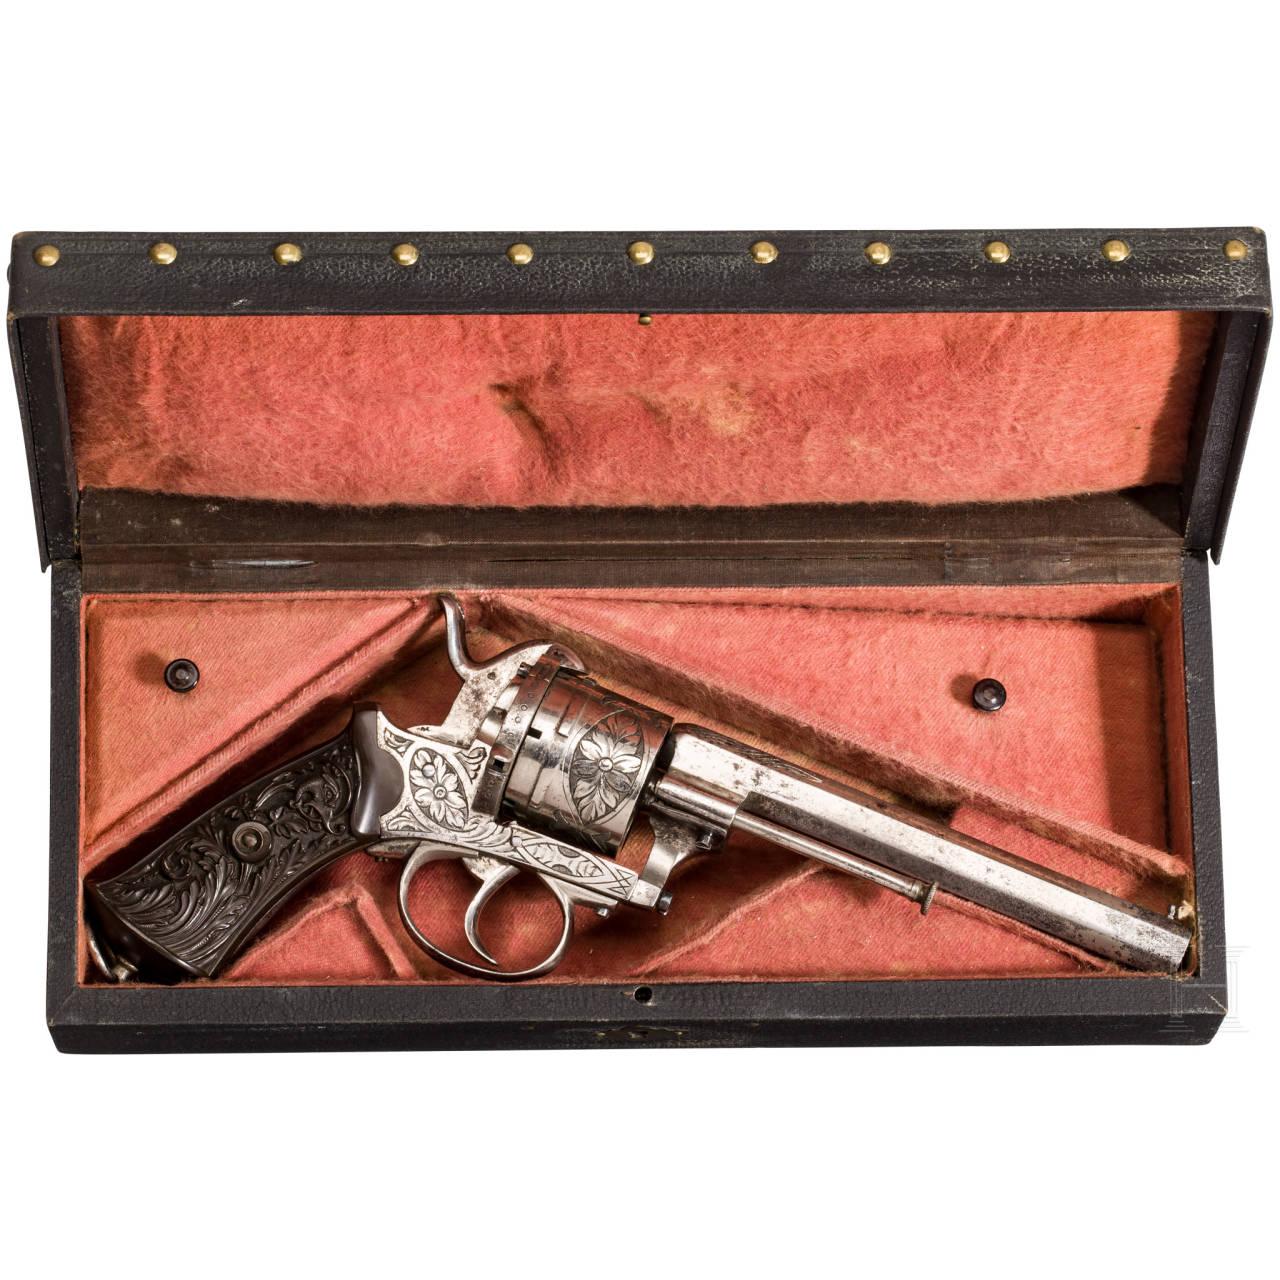 A pinfire revolver, Belgium